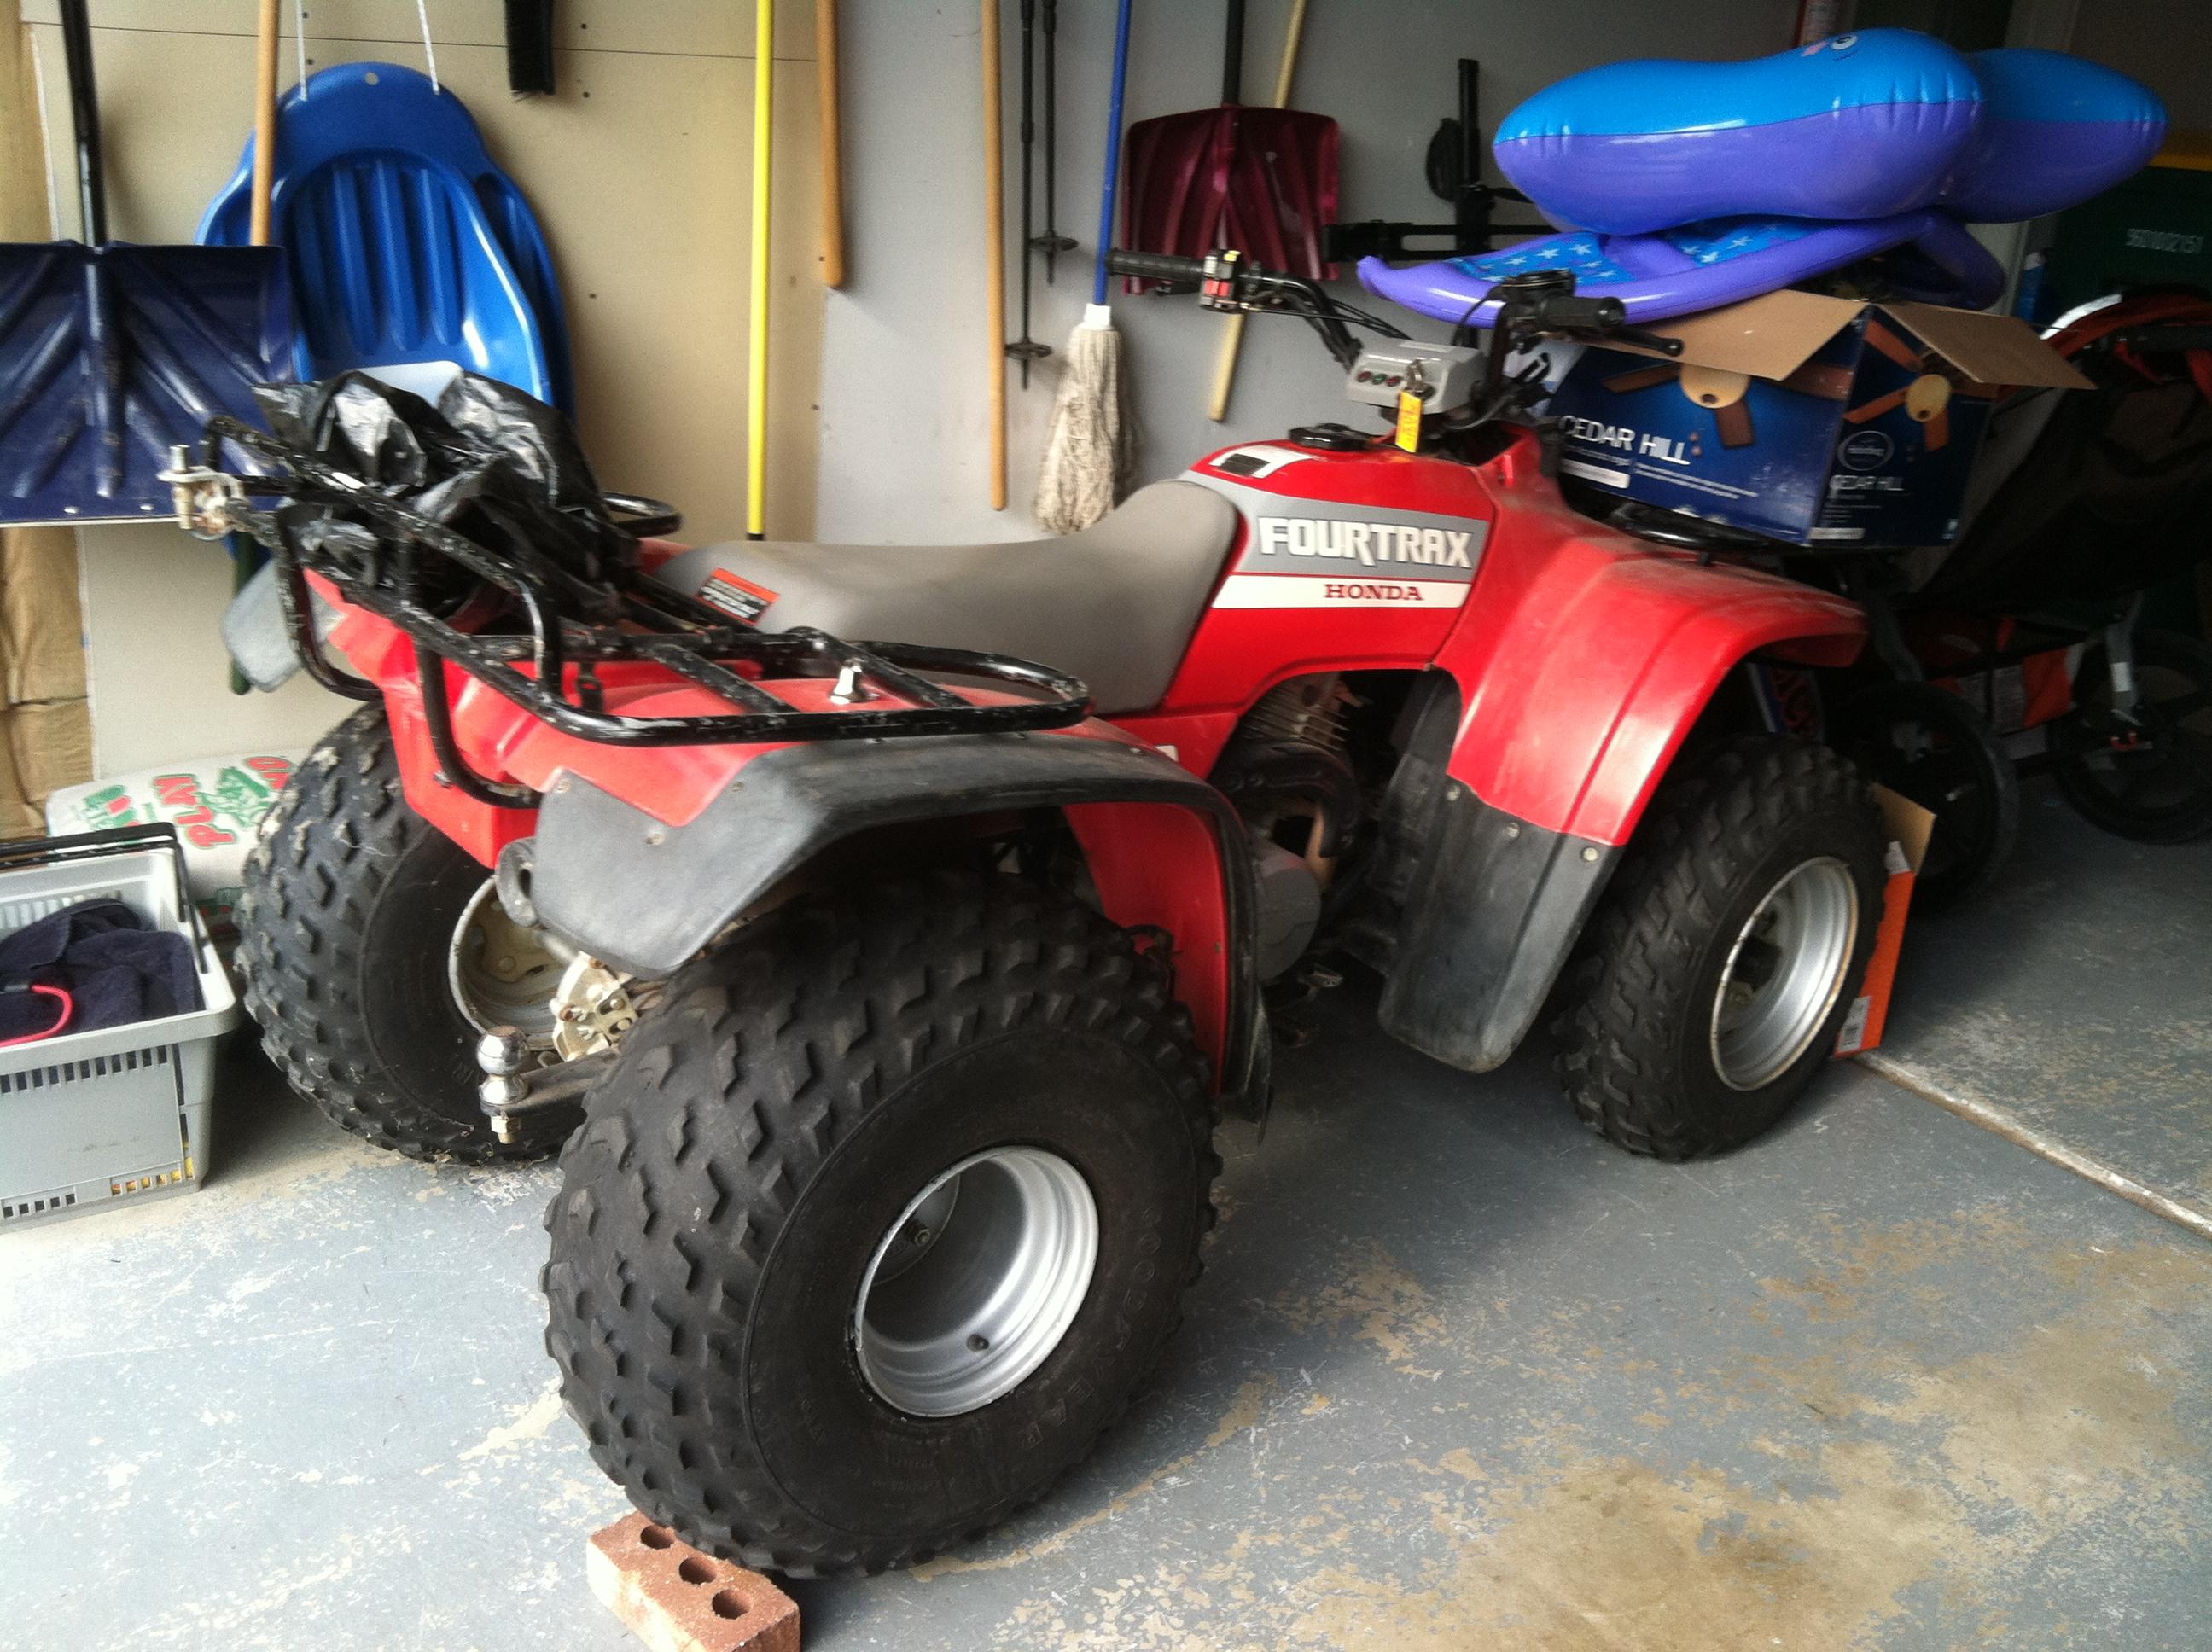 Honda Fit Rim Size >> 1988 FourTrax 2wd300 - old tires/wheels. Need upgrade size! - Honda ATV Forum